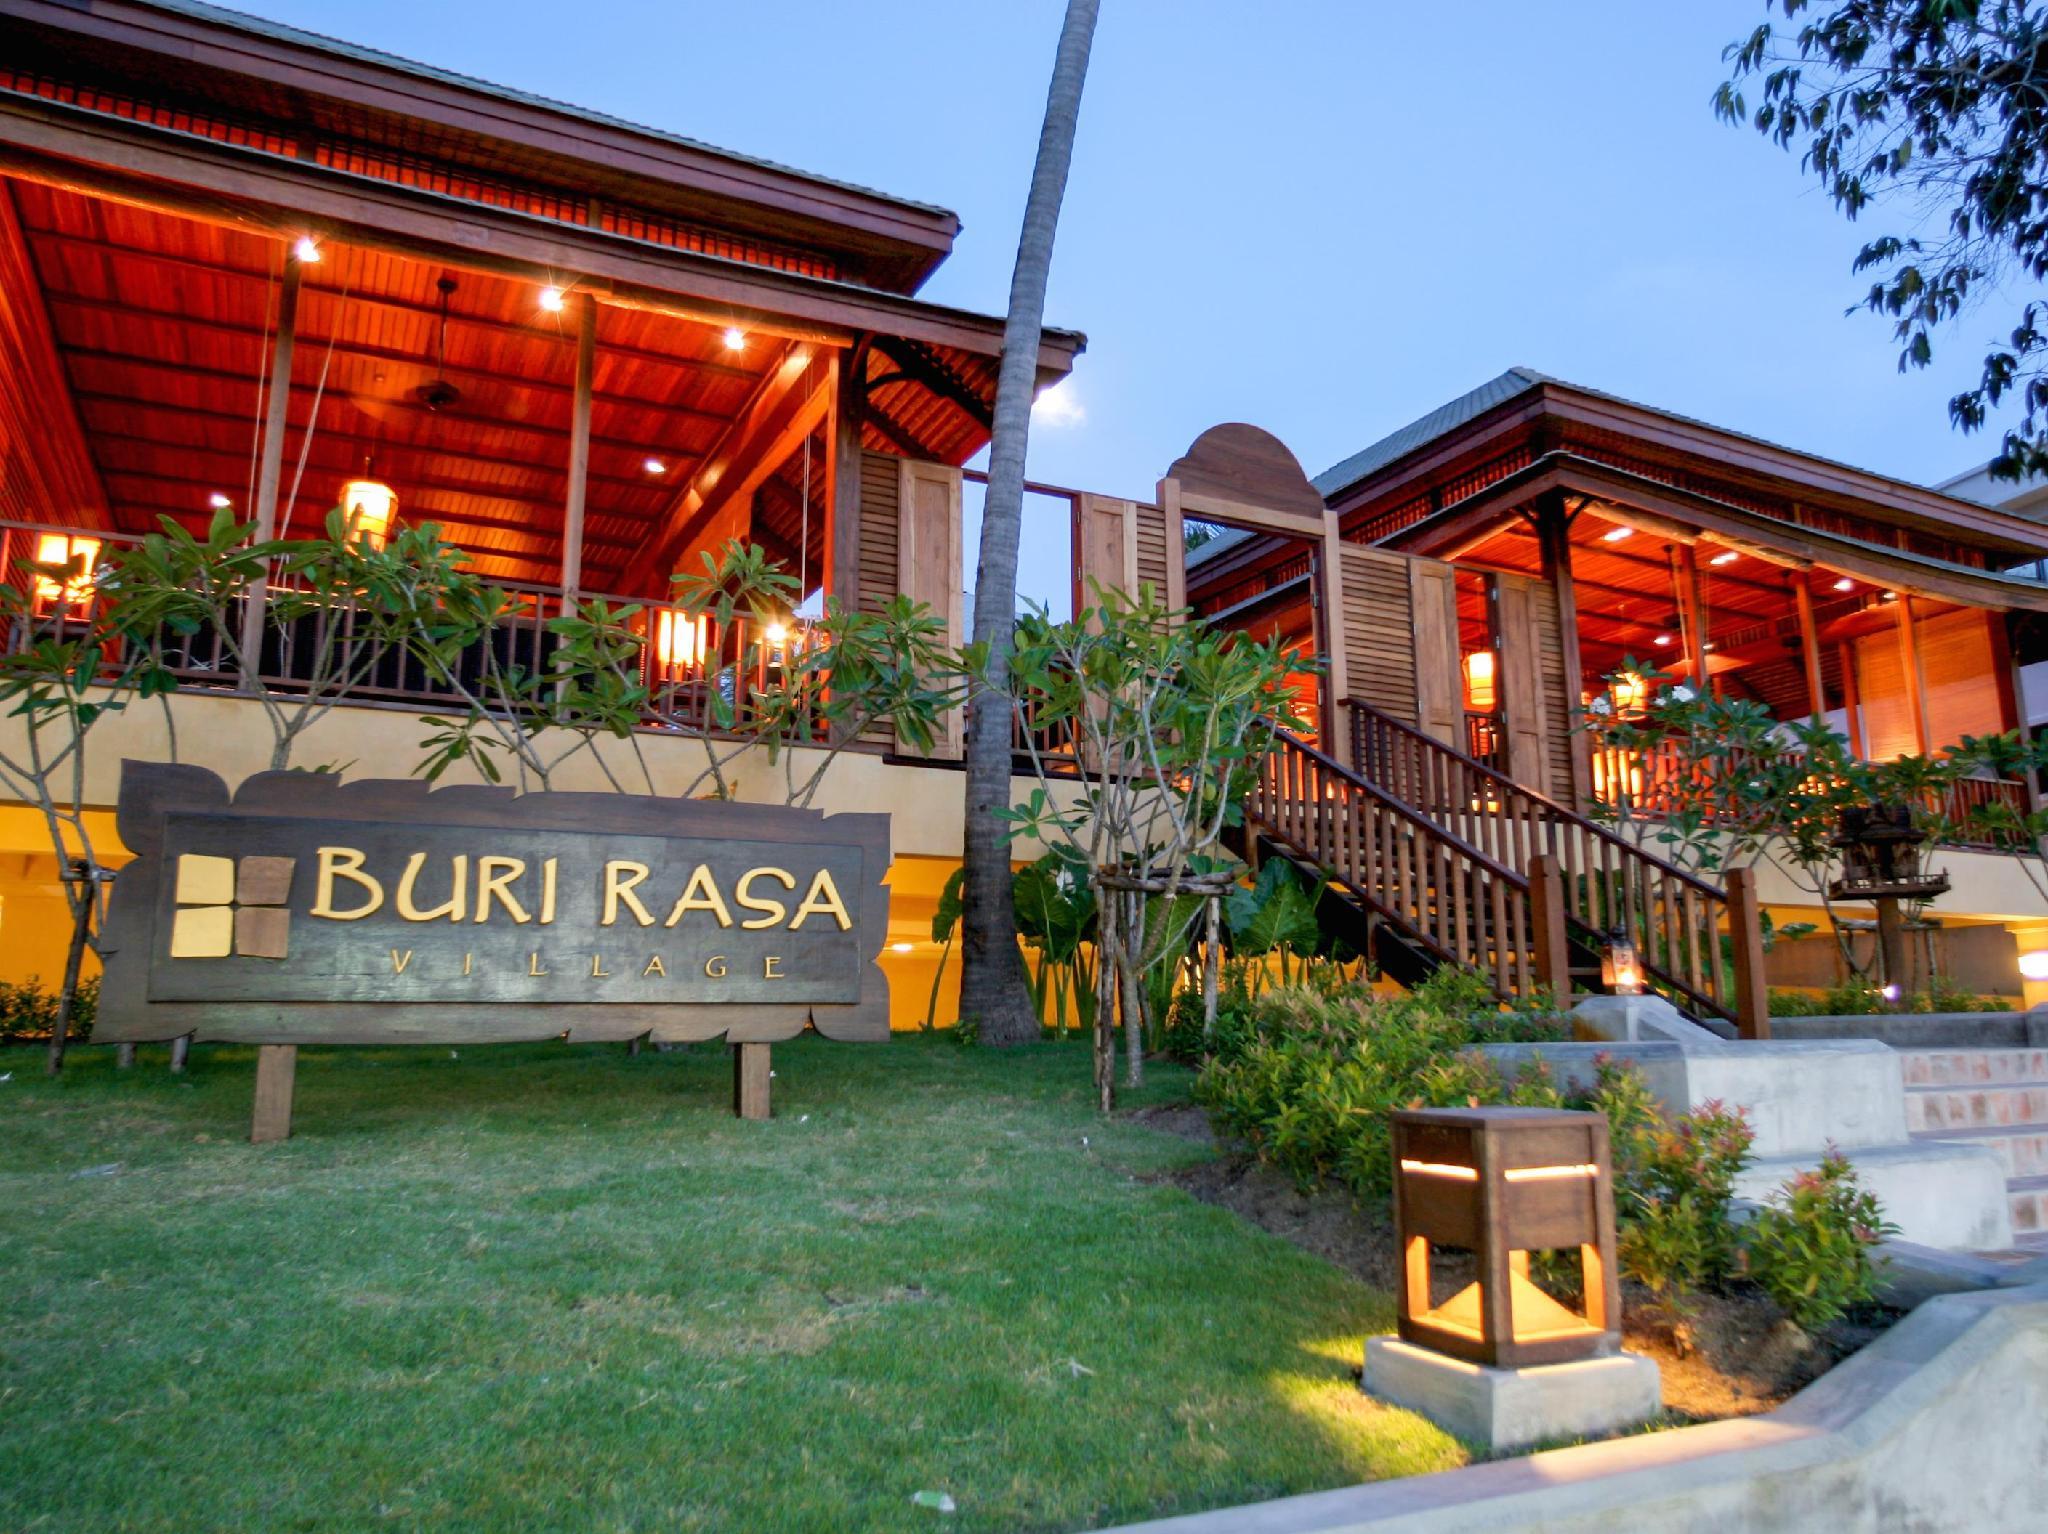 Buri Rasa Village Hotel - Koh Samui